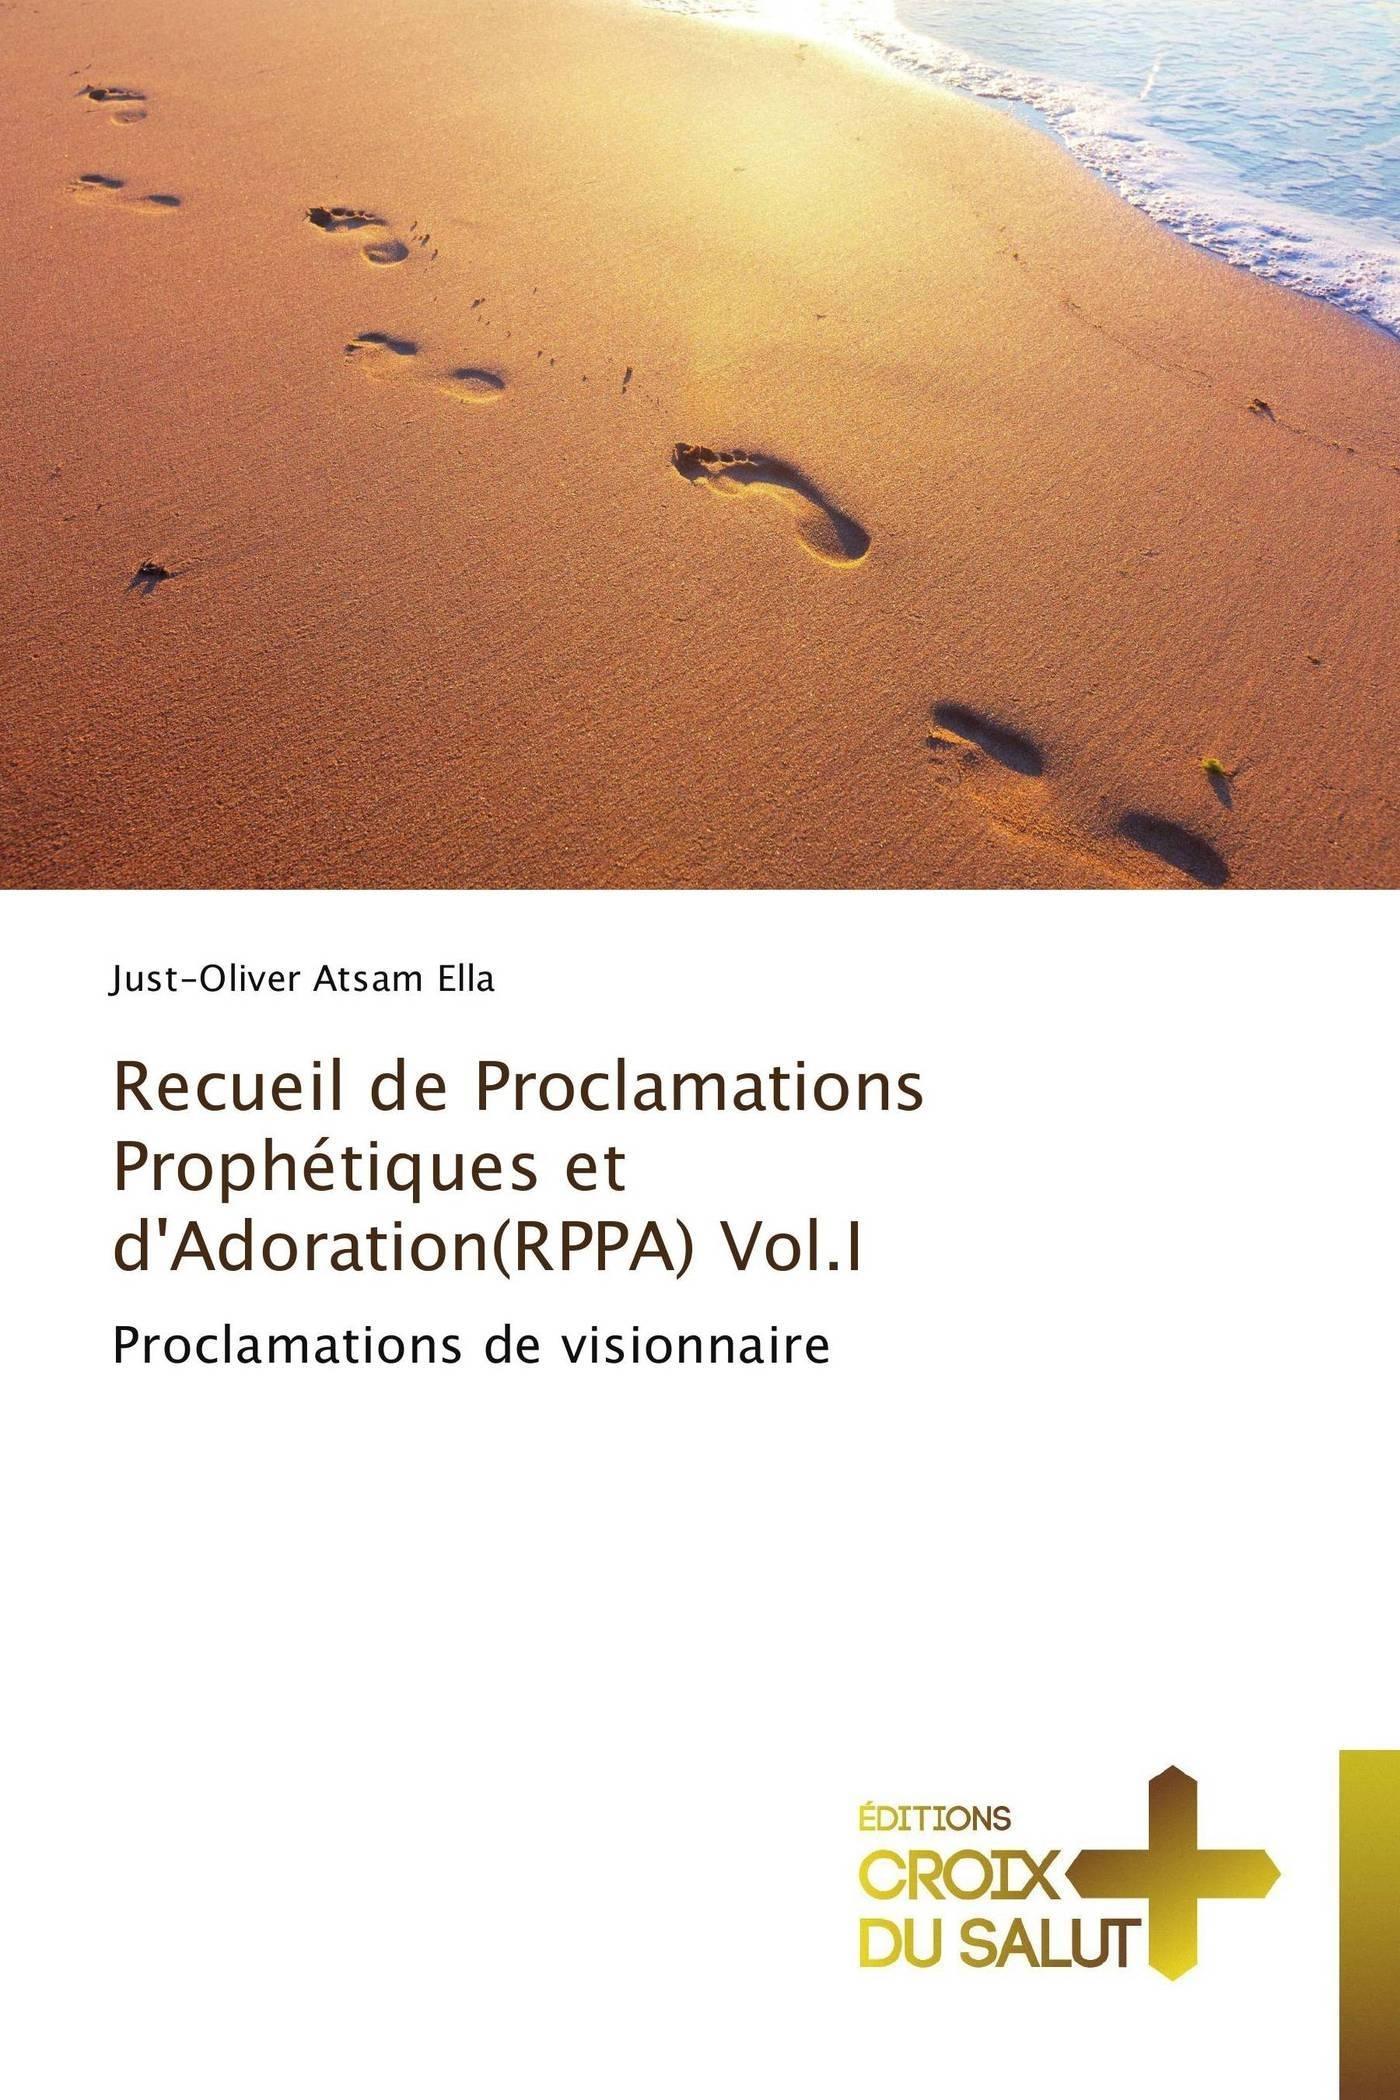 RECUEIL DE PROCLAMATIONS PROPHETIQUES ET D'ADORATION(RPPA) VOL.I